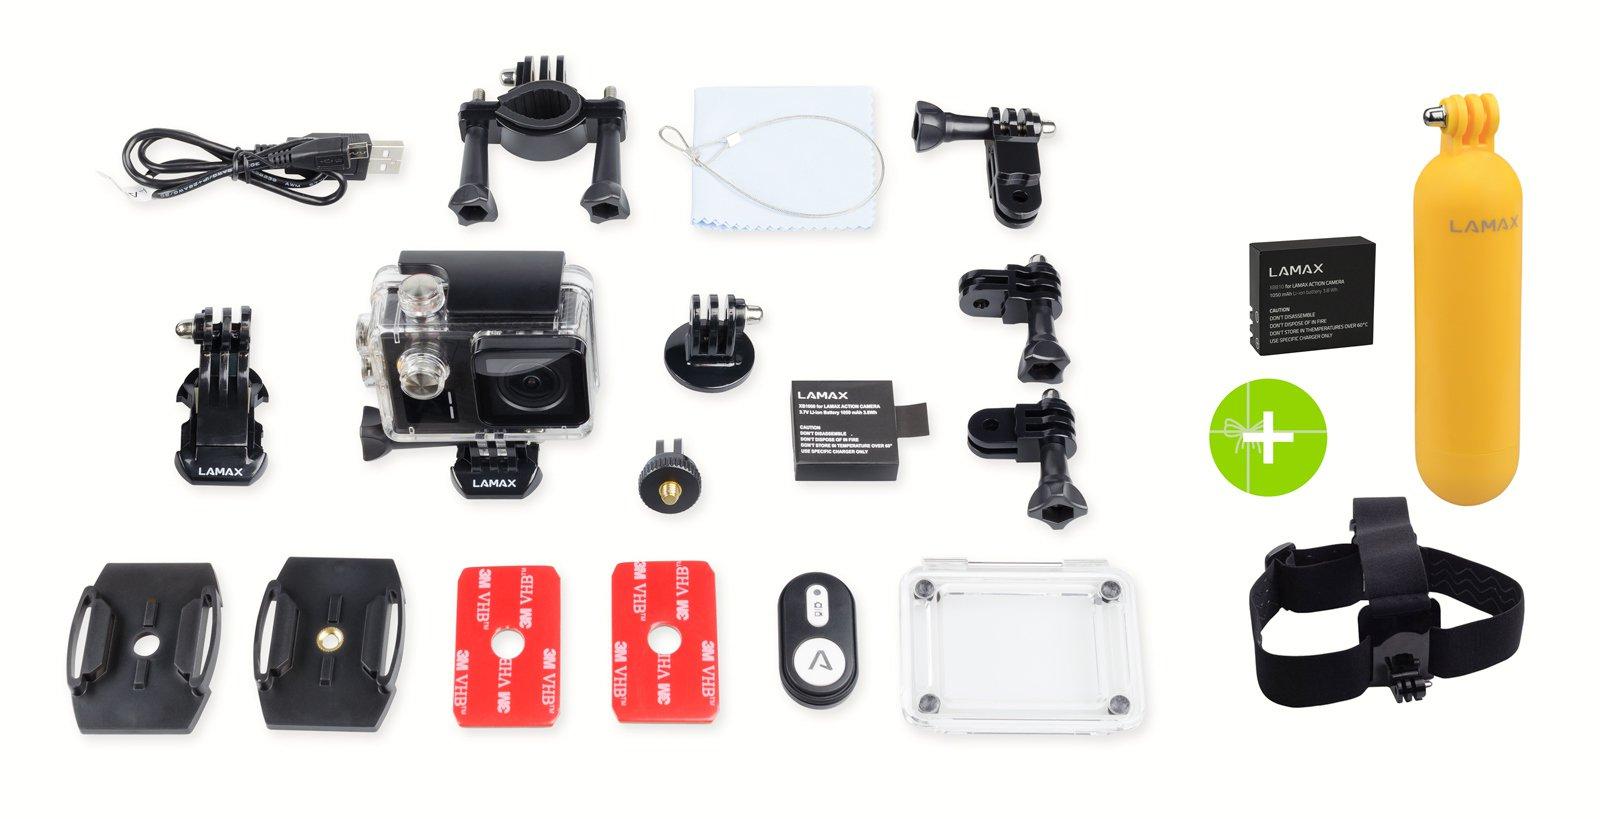 X10 Taurus accessories